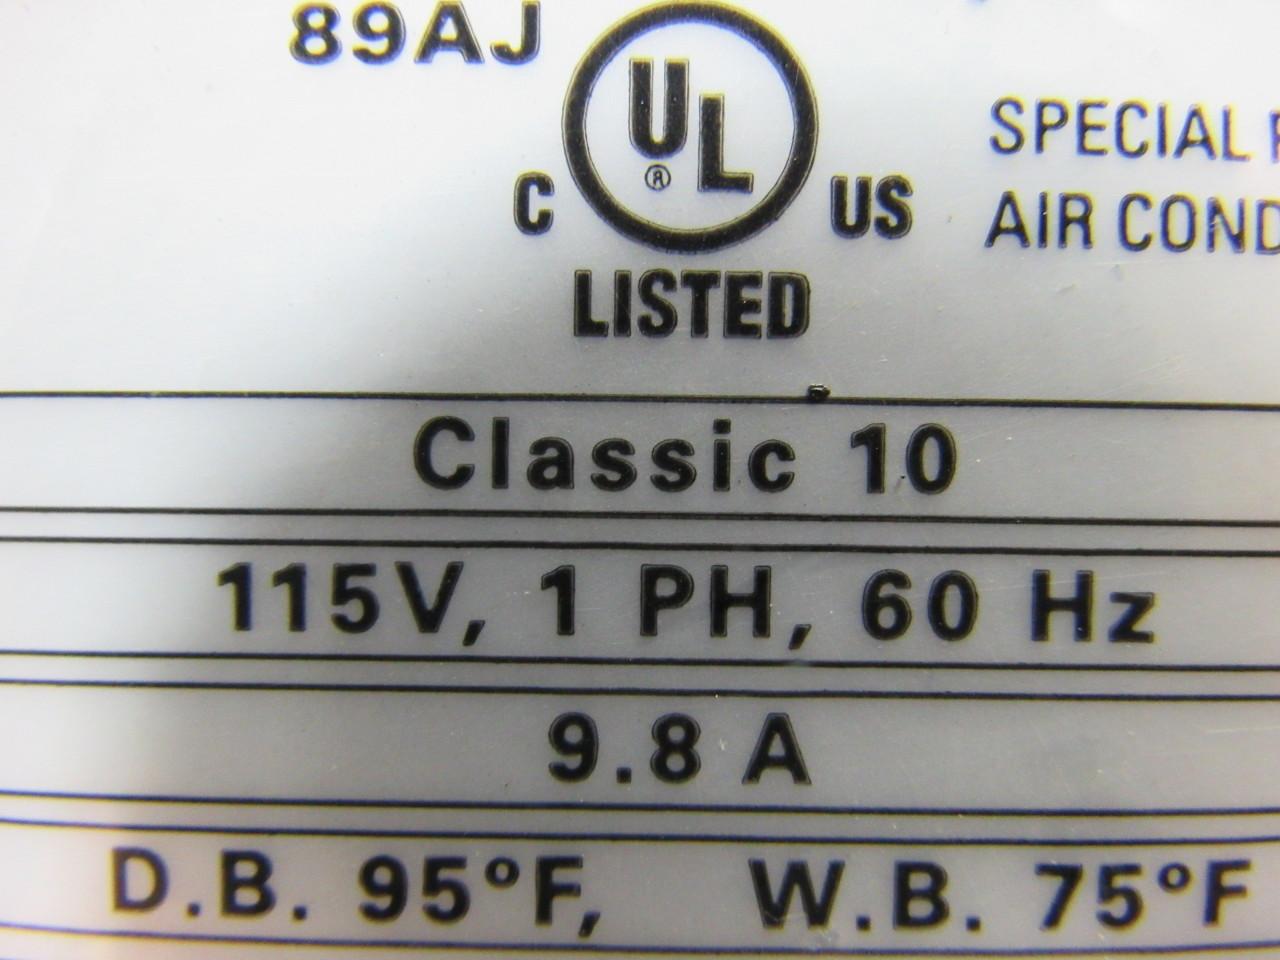 Movincool Classic 10 Portable Air Conditioner 115v 1ph 10 000 Btu/hr  #445187